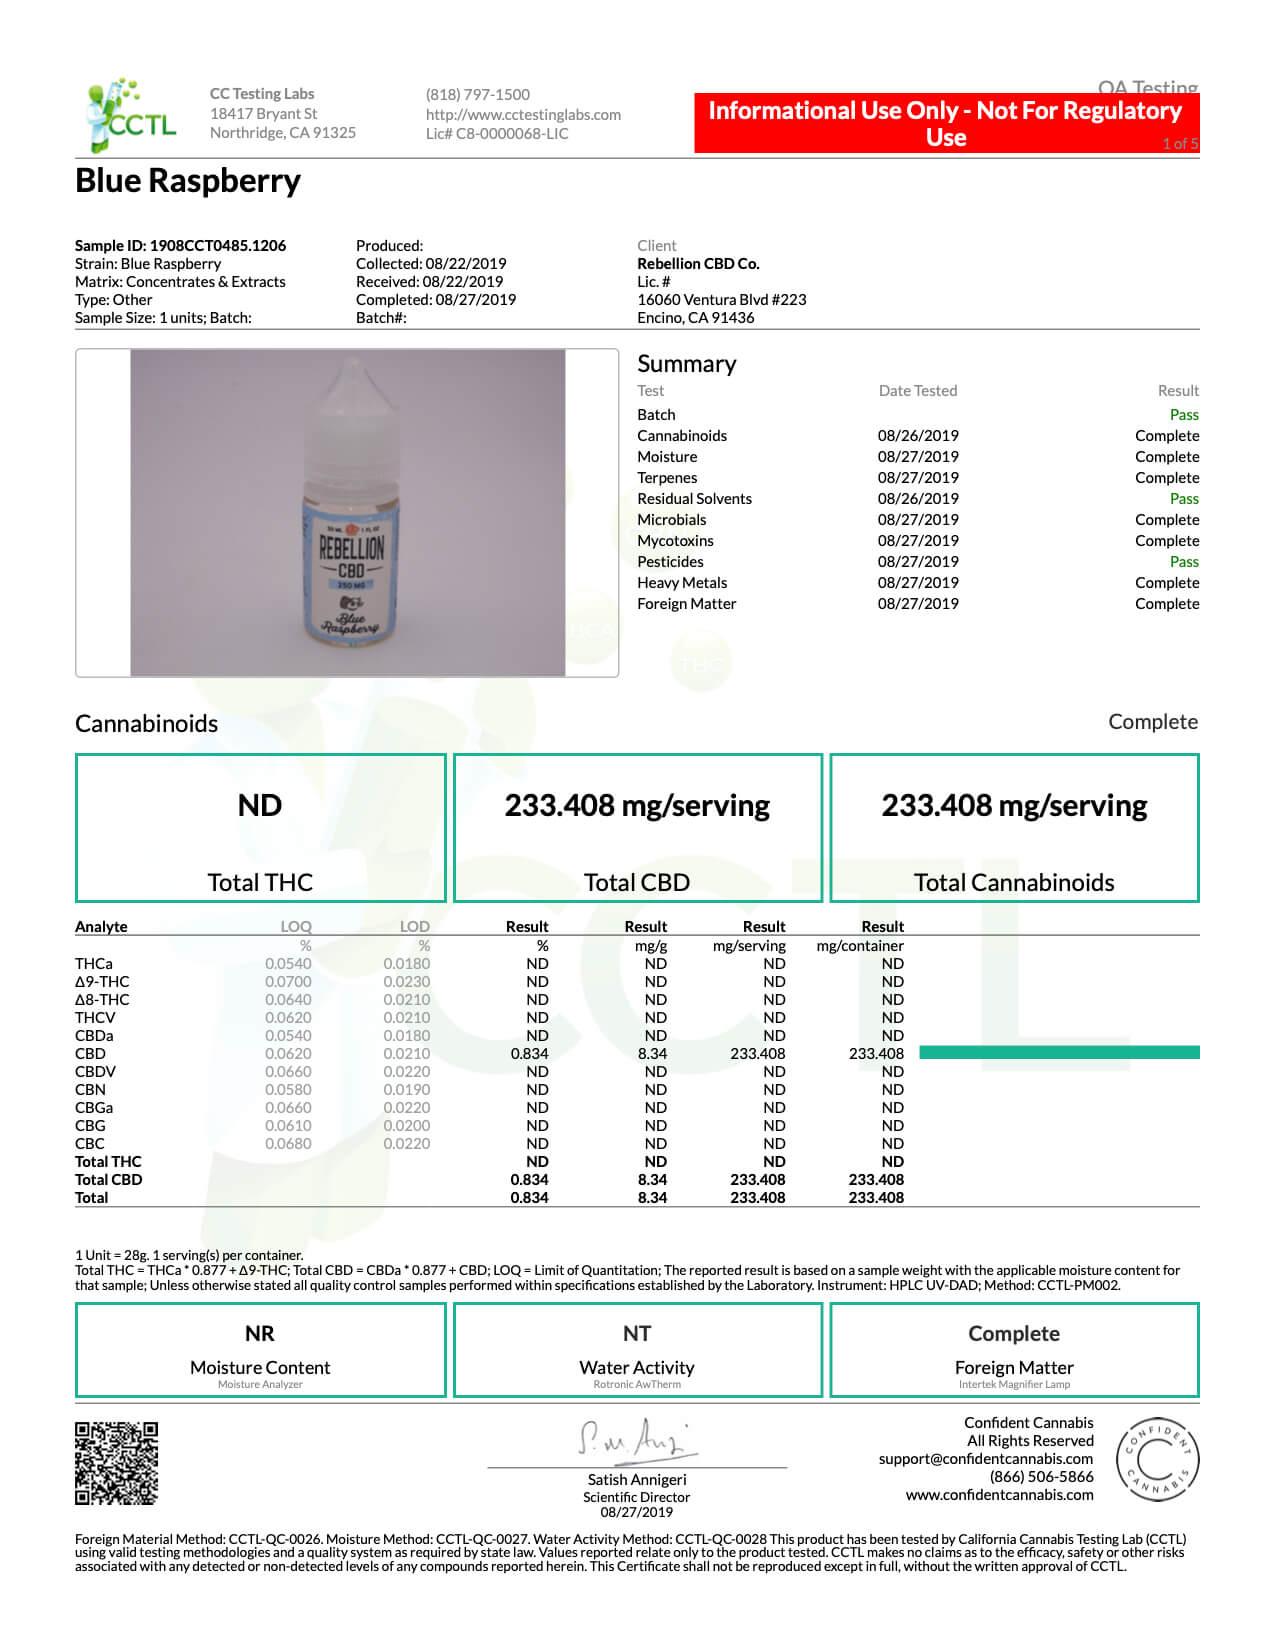 REBELLION CBD Blue Raspberry E-Juice 250mg